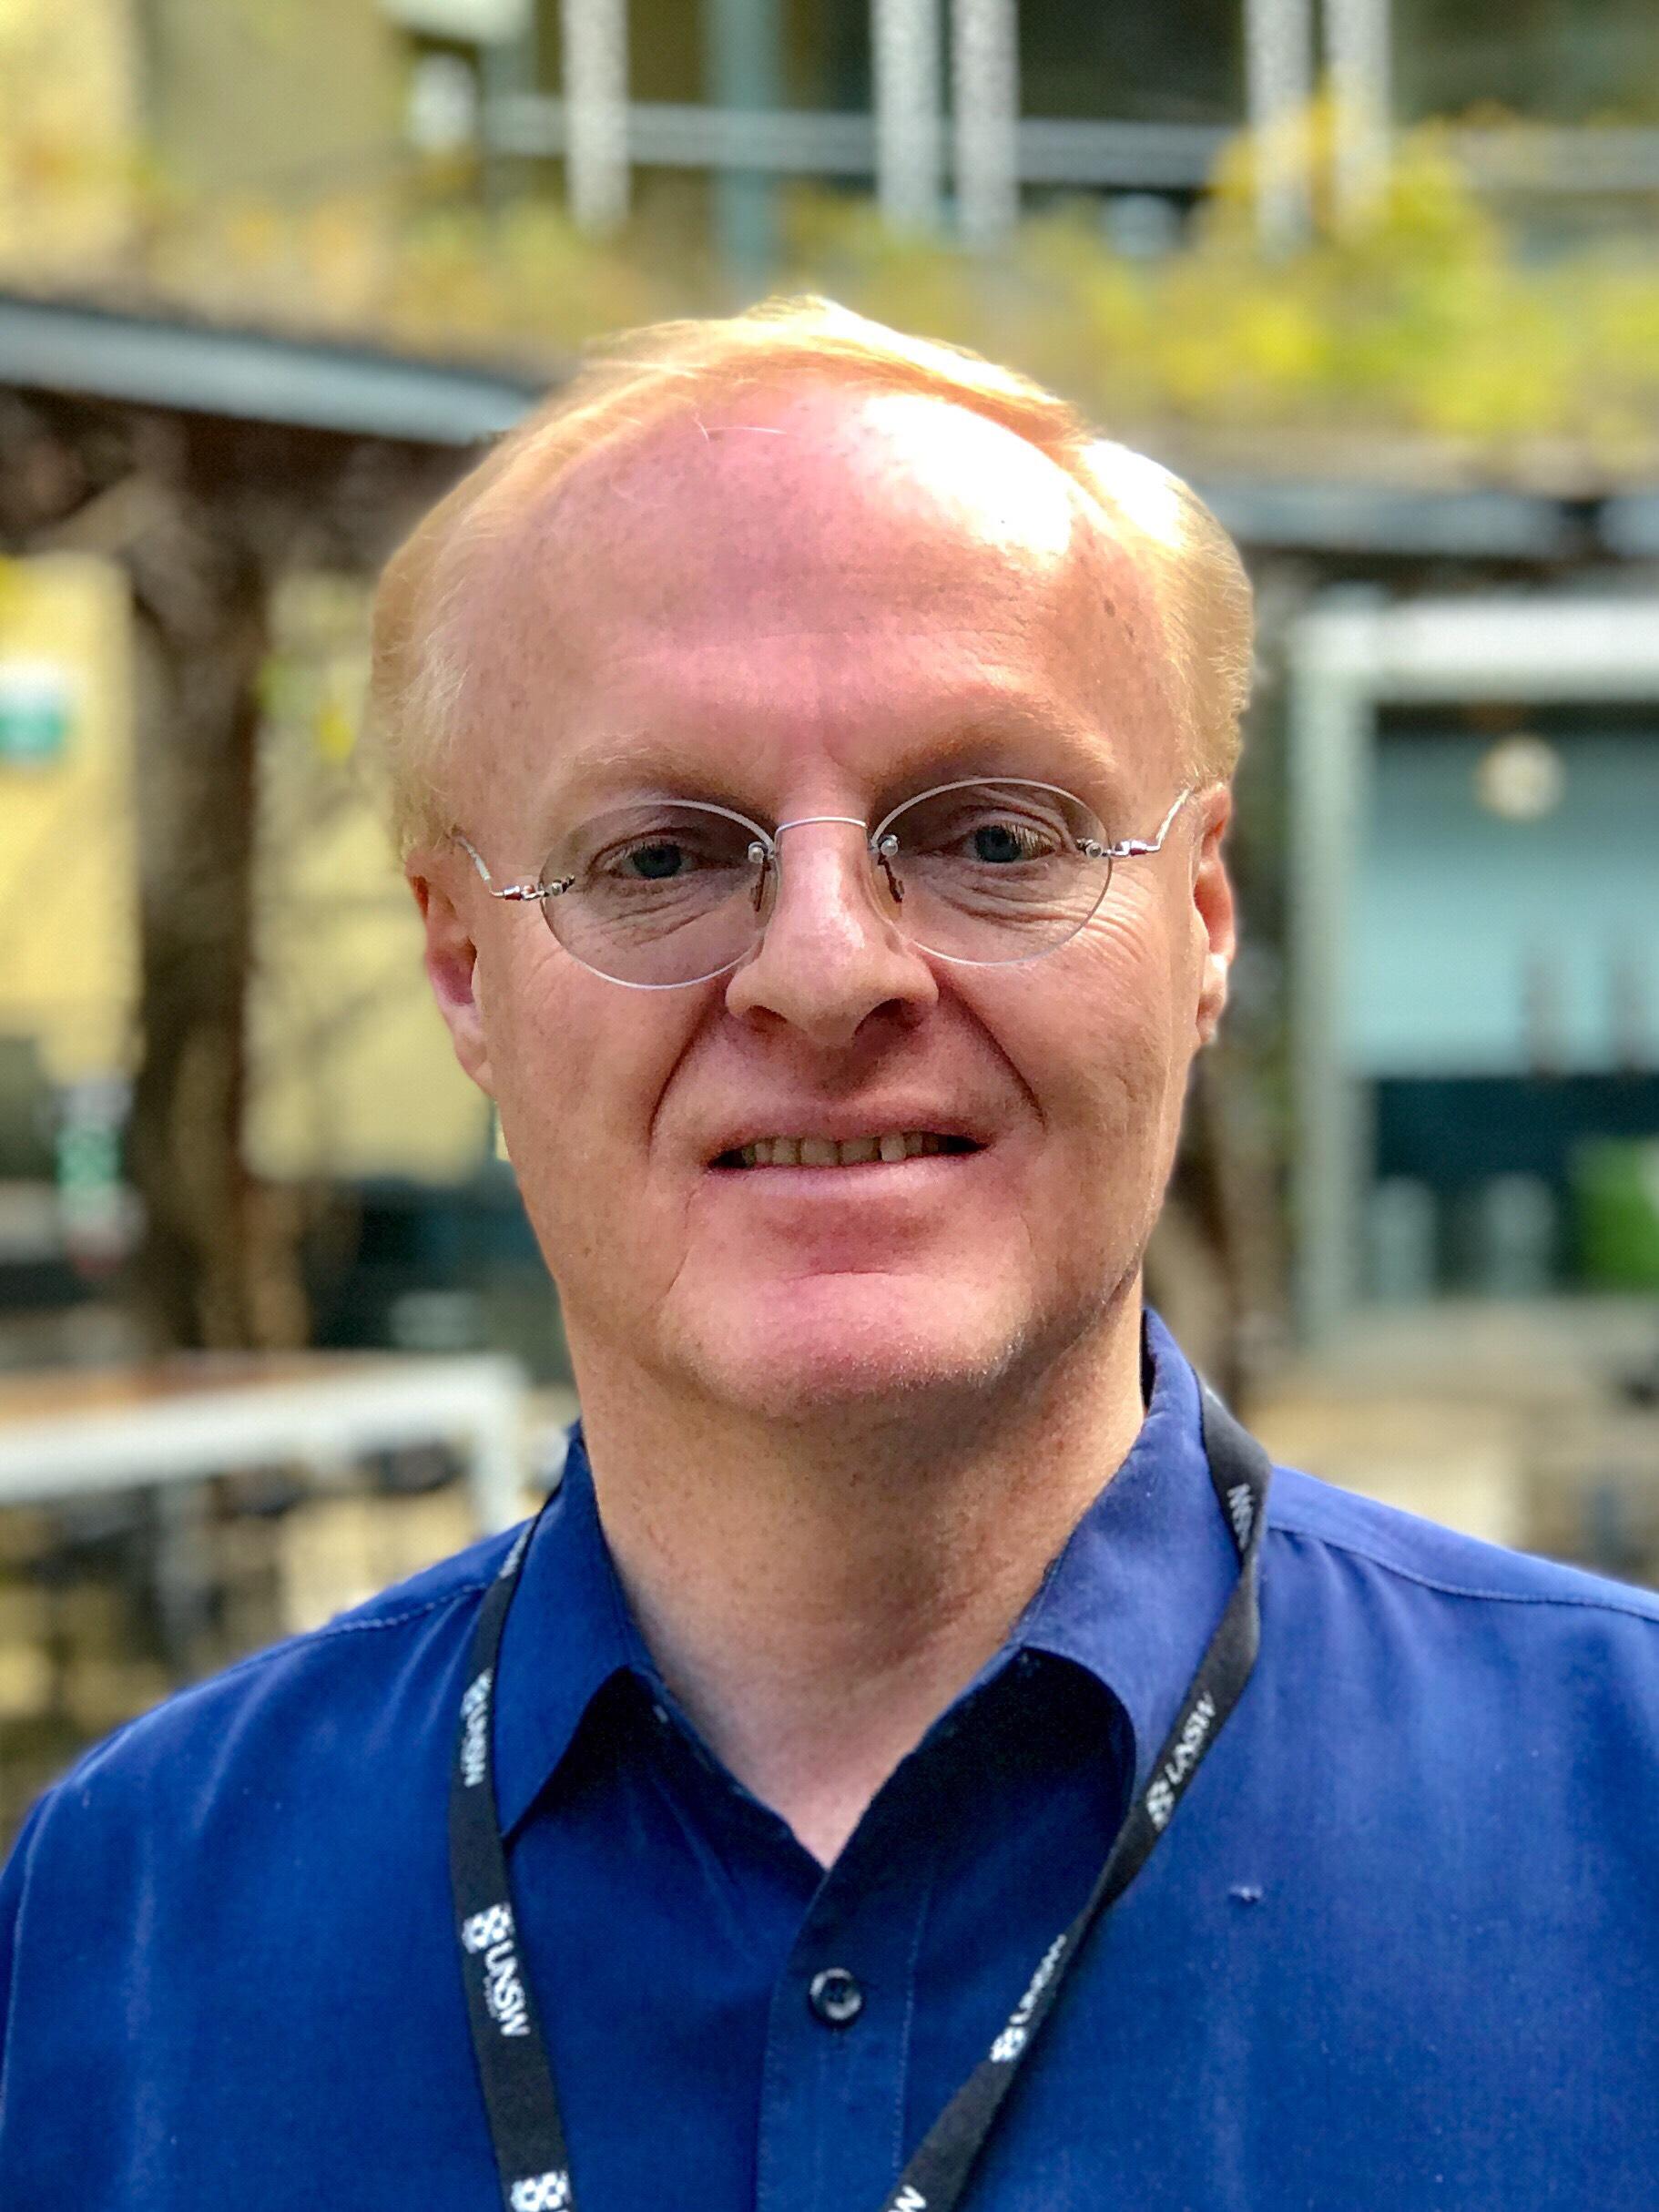 Dr Martin Paul Bucknall